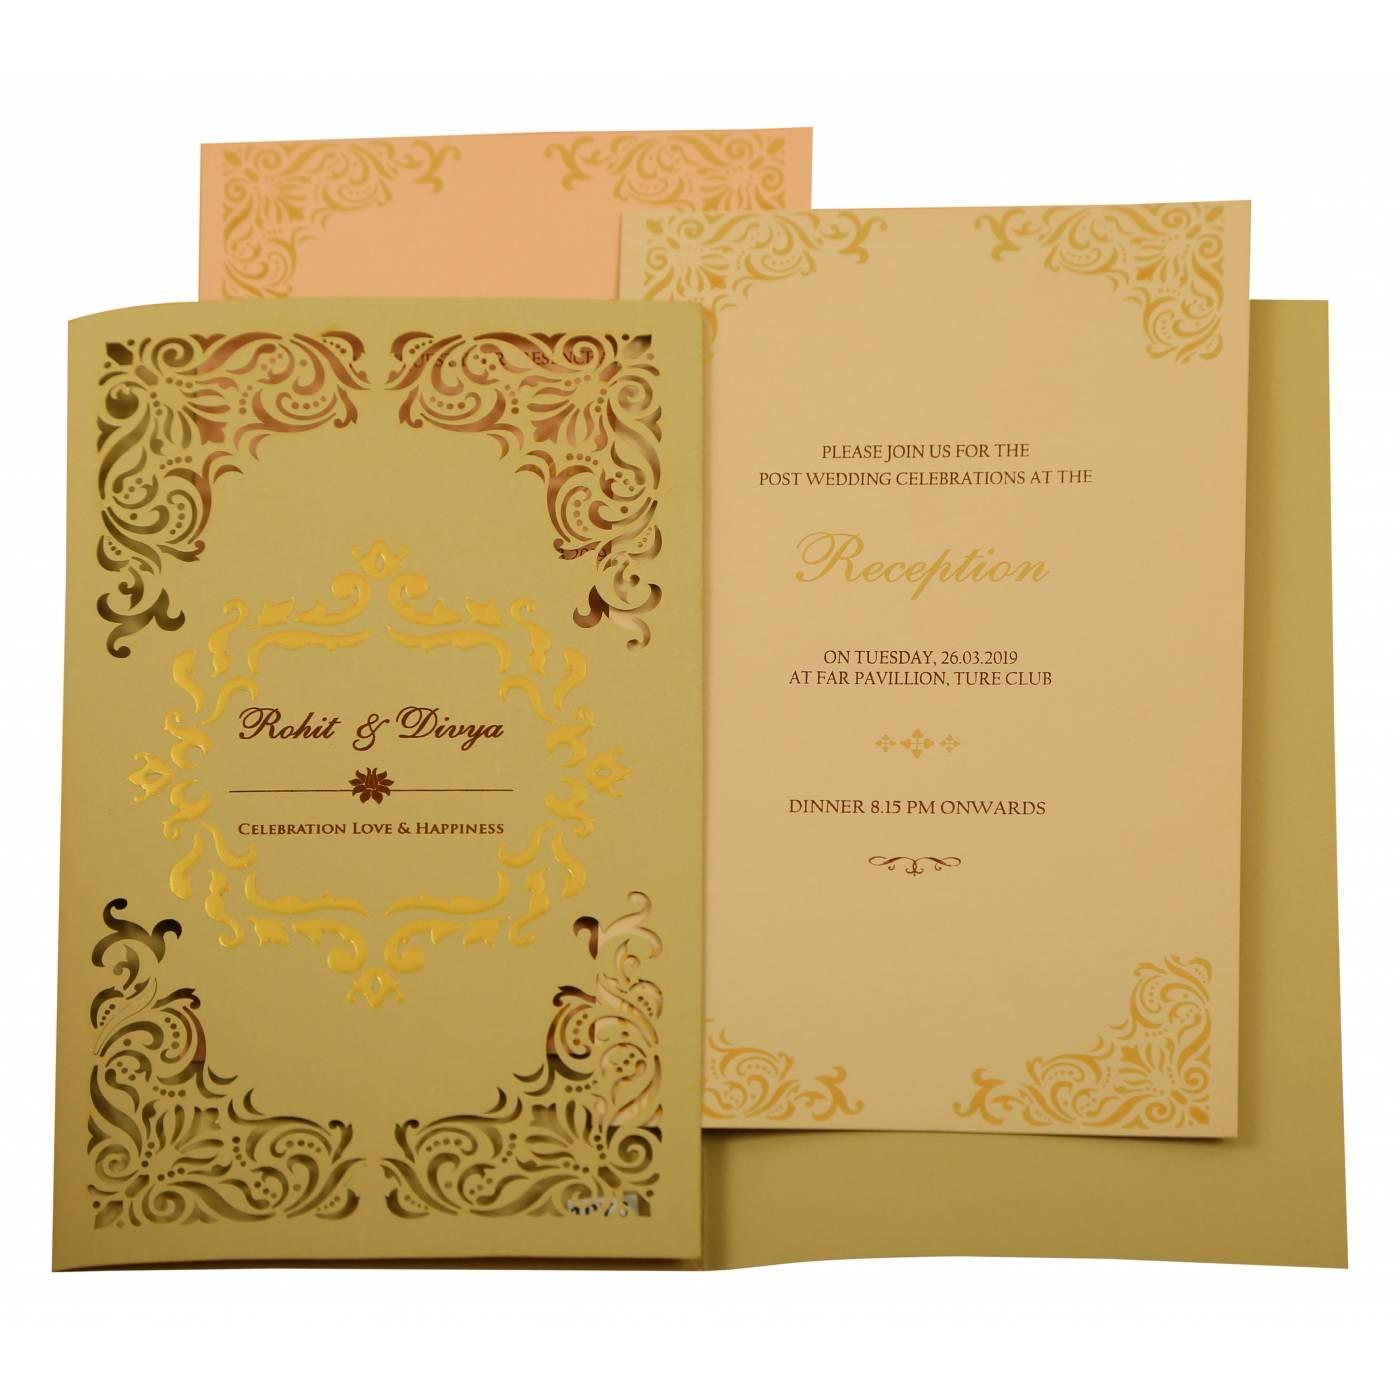 WEDDING INVITATION : CC-1908 - IndianWeddingCards